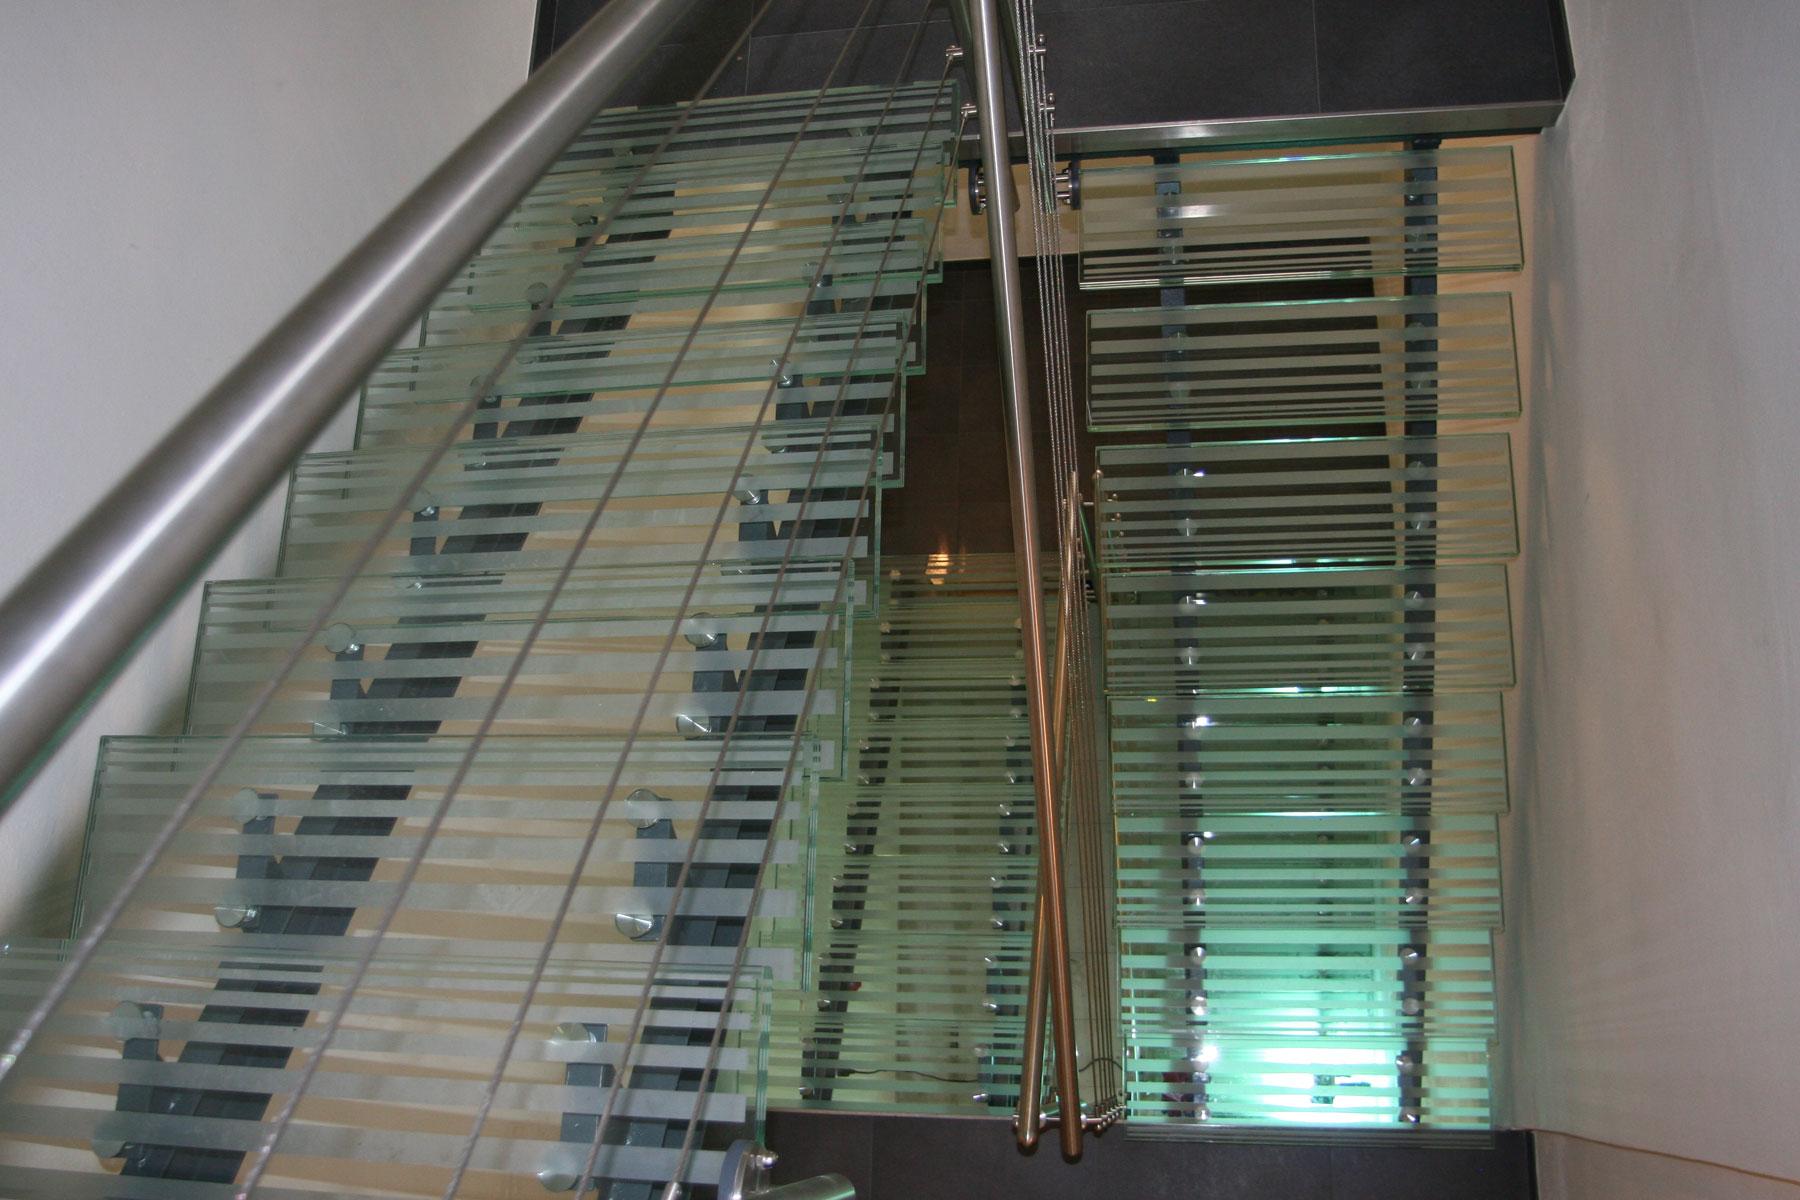 Sklenarstvi-Prerost-schody-a- pochozi-sklo (17)